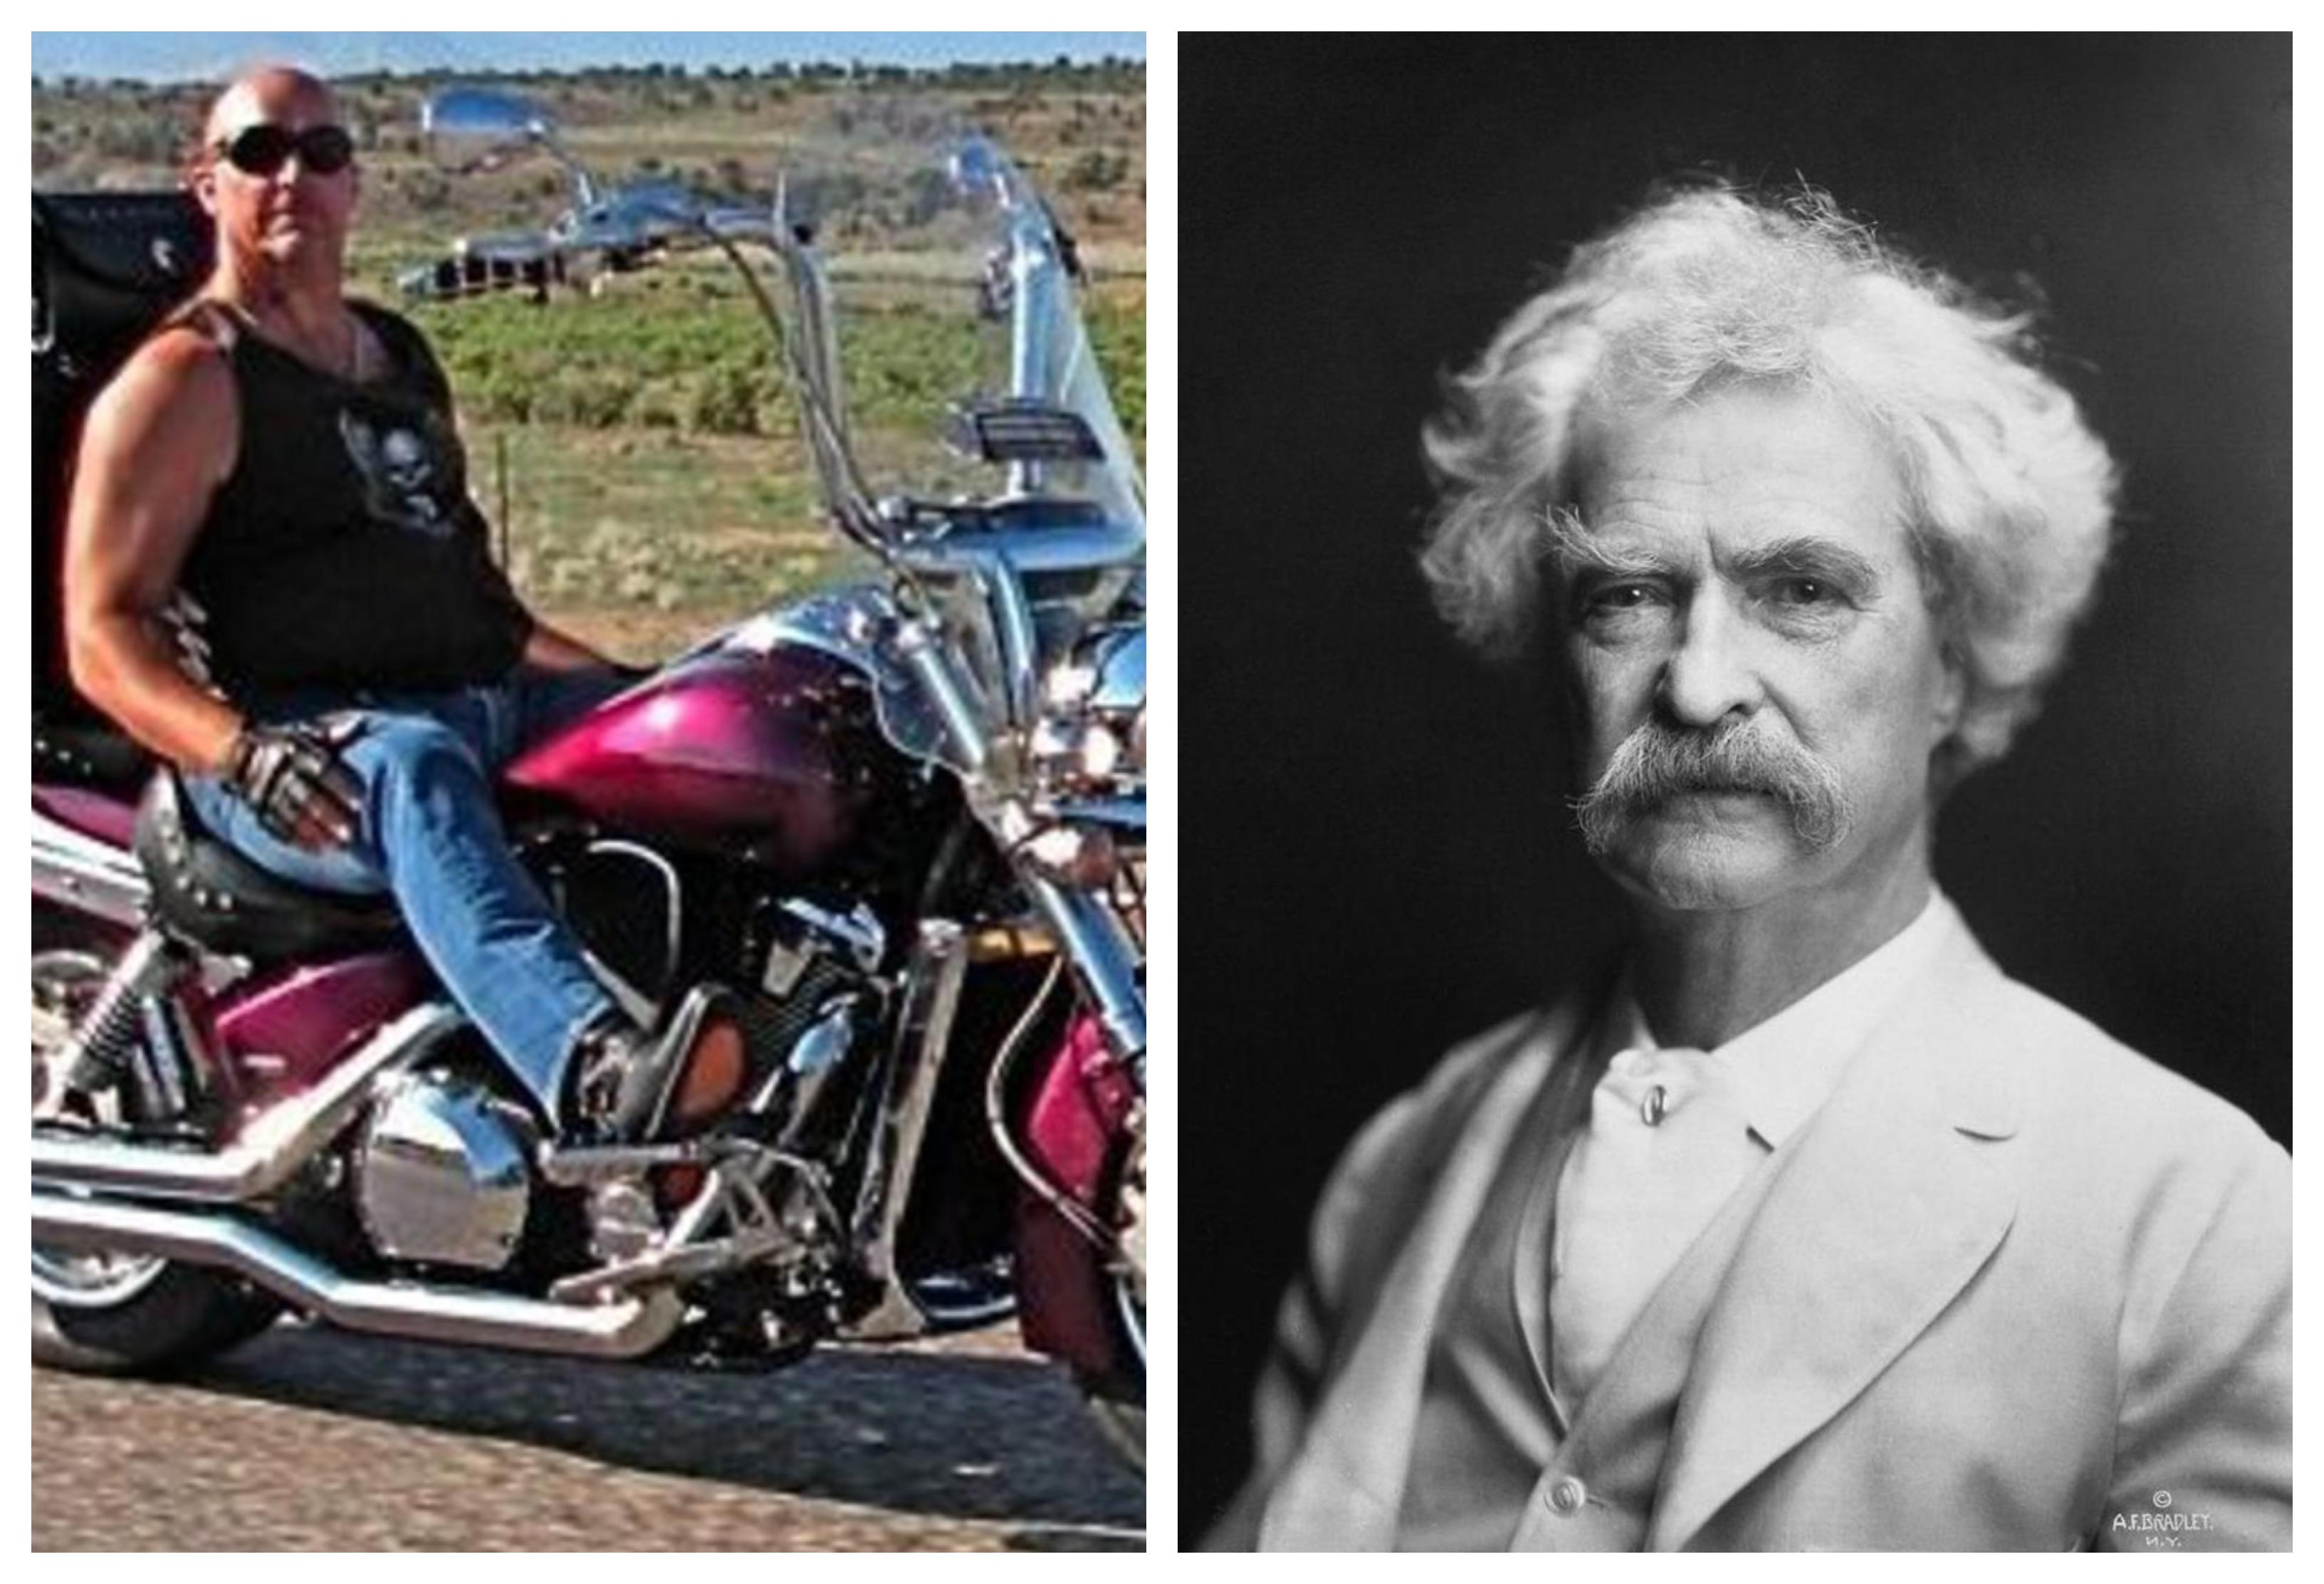 Frank Pastore in Mark Twain (vir Facebook)